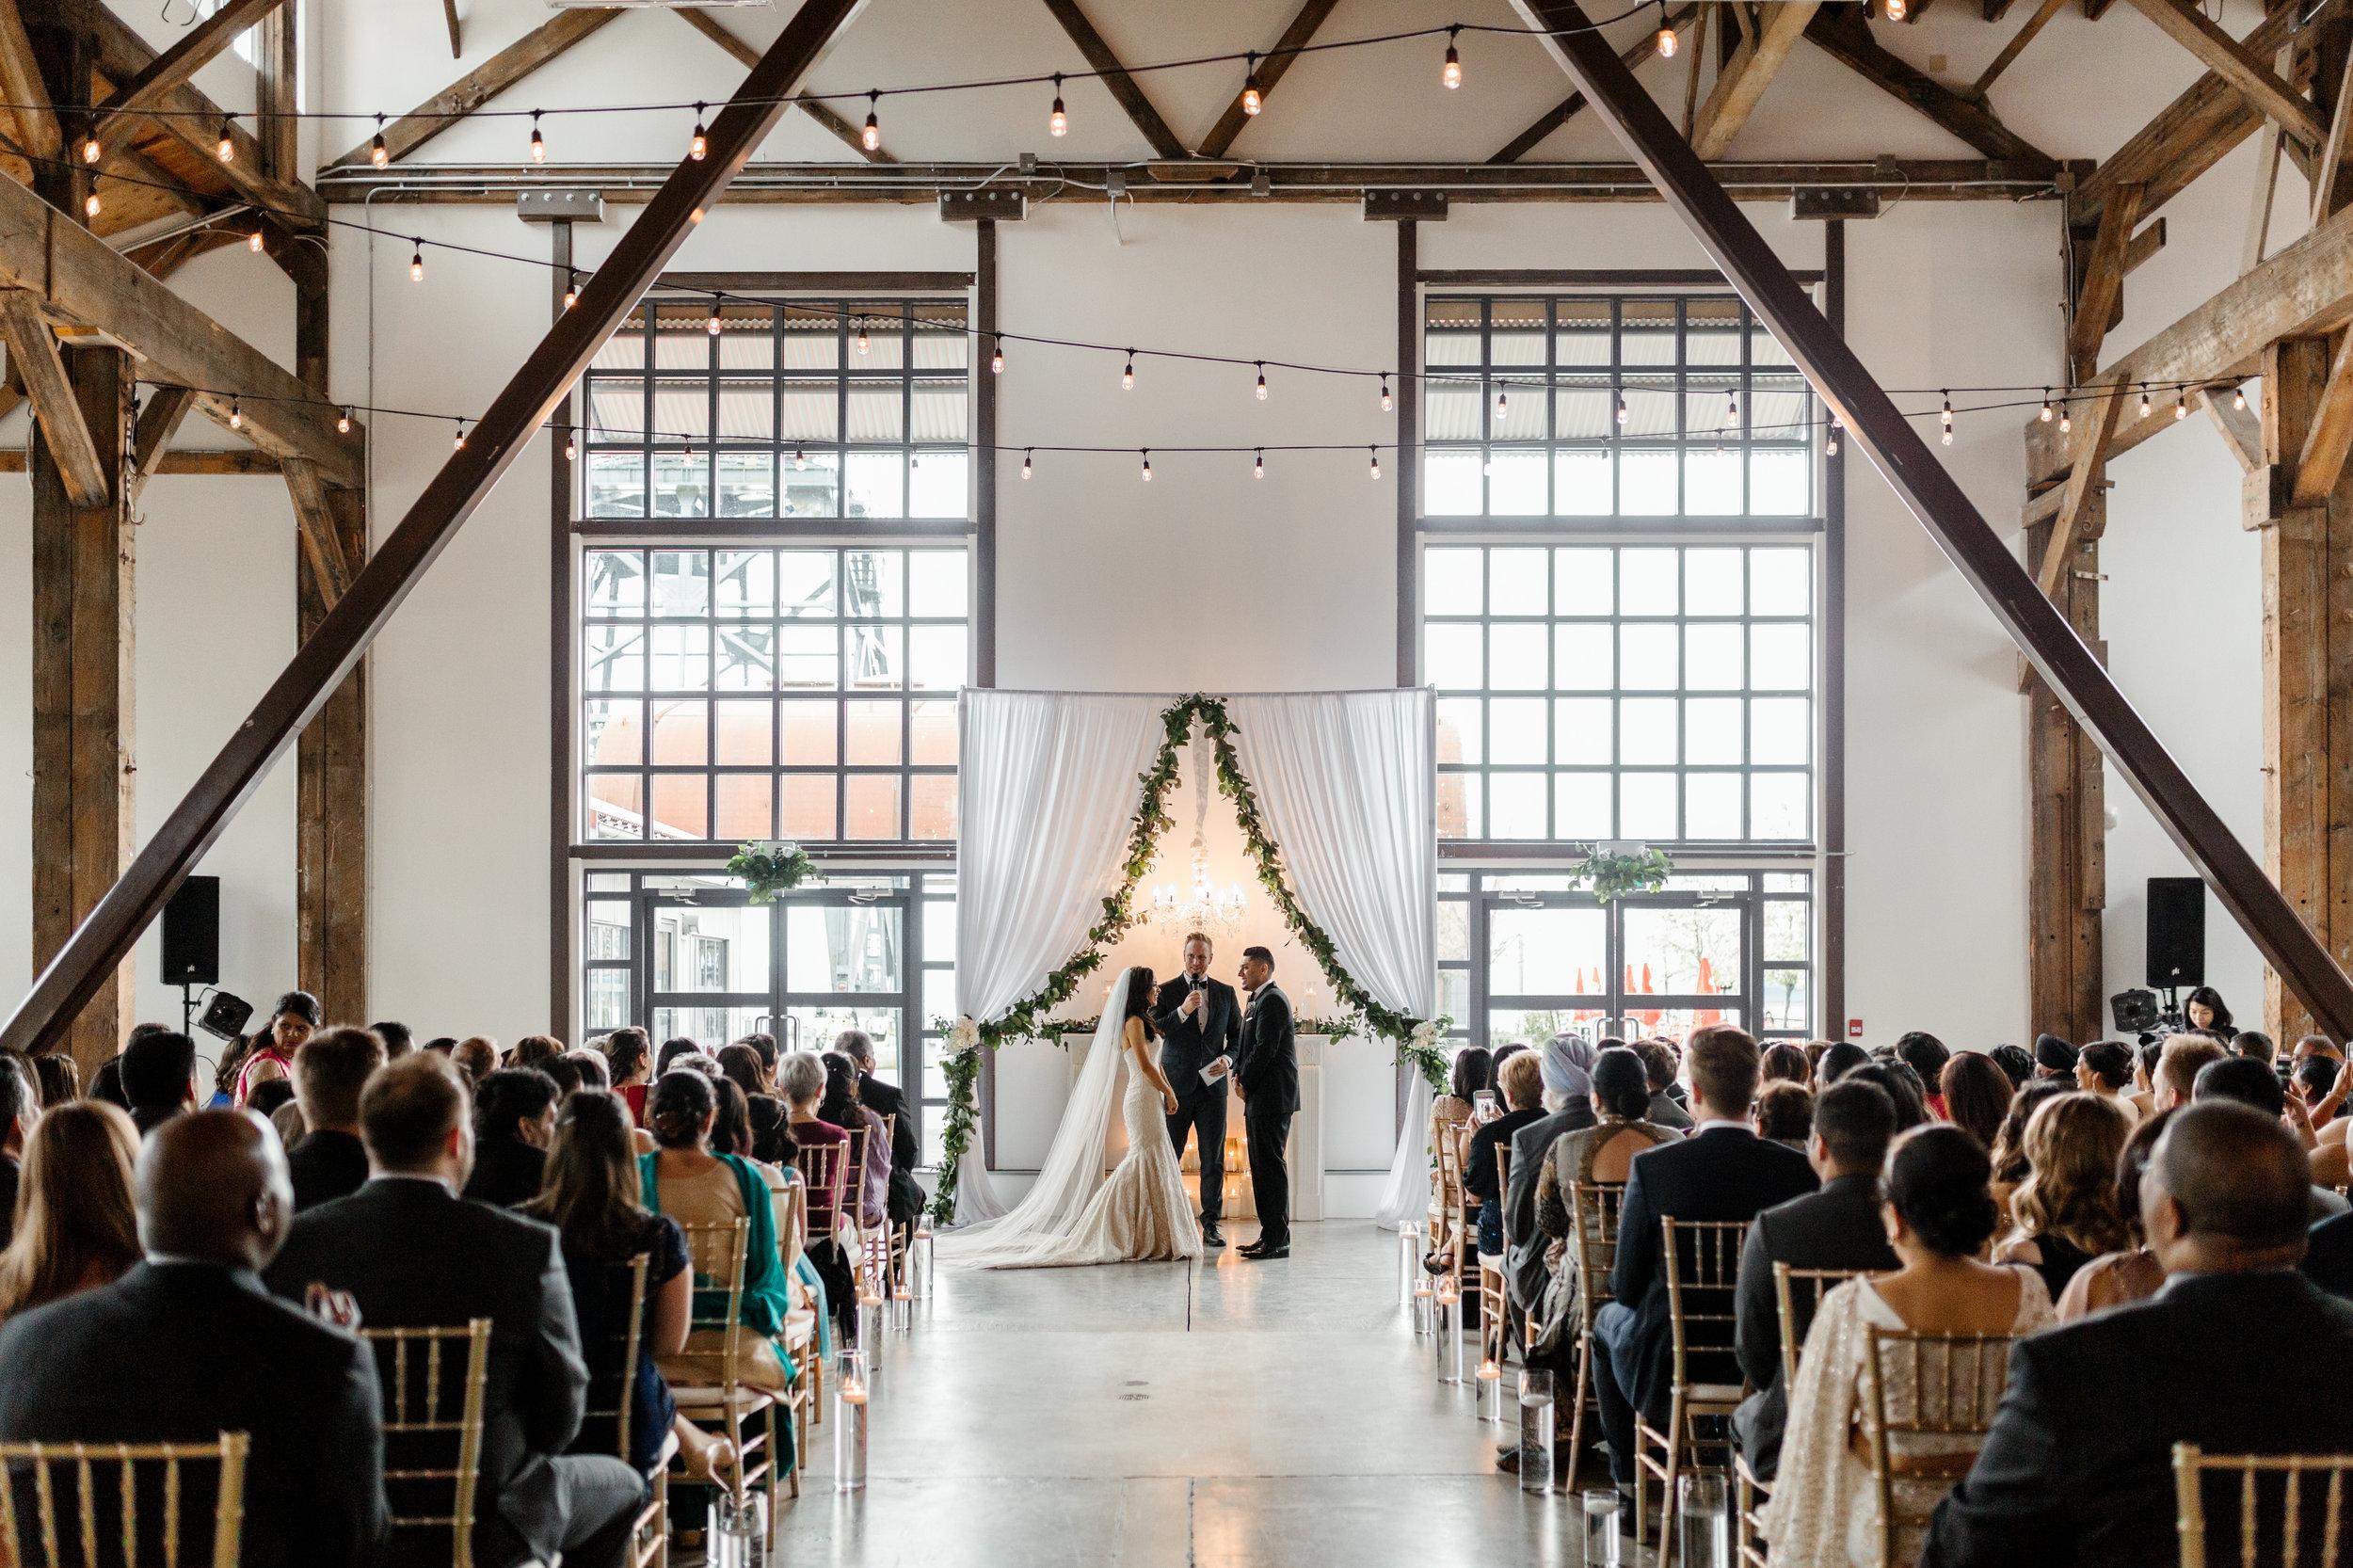 herafilms_wedding_trina_andy_hera_selects-54.jpg